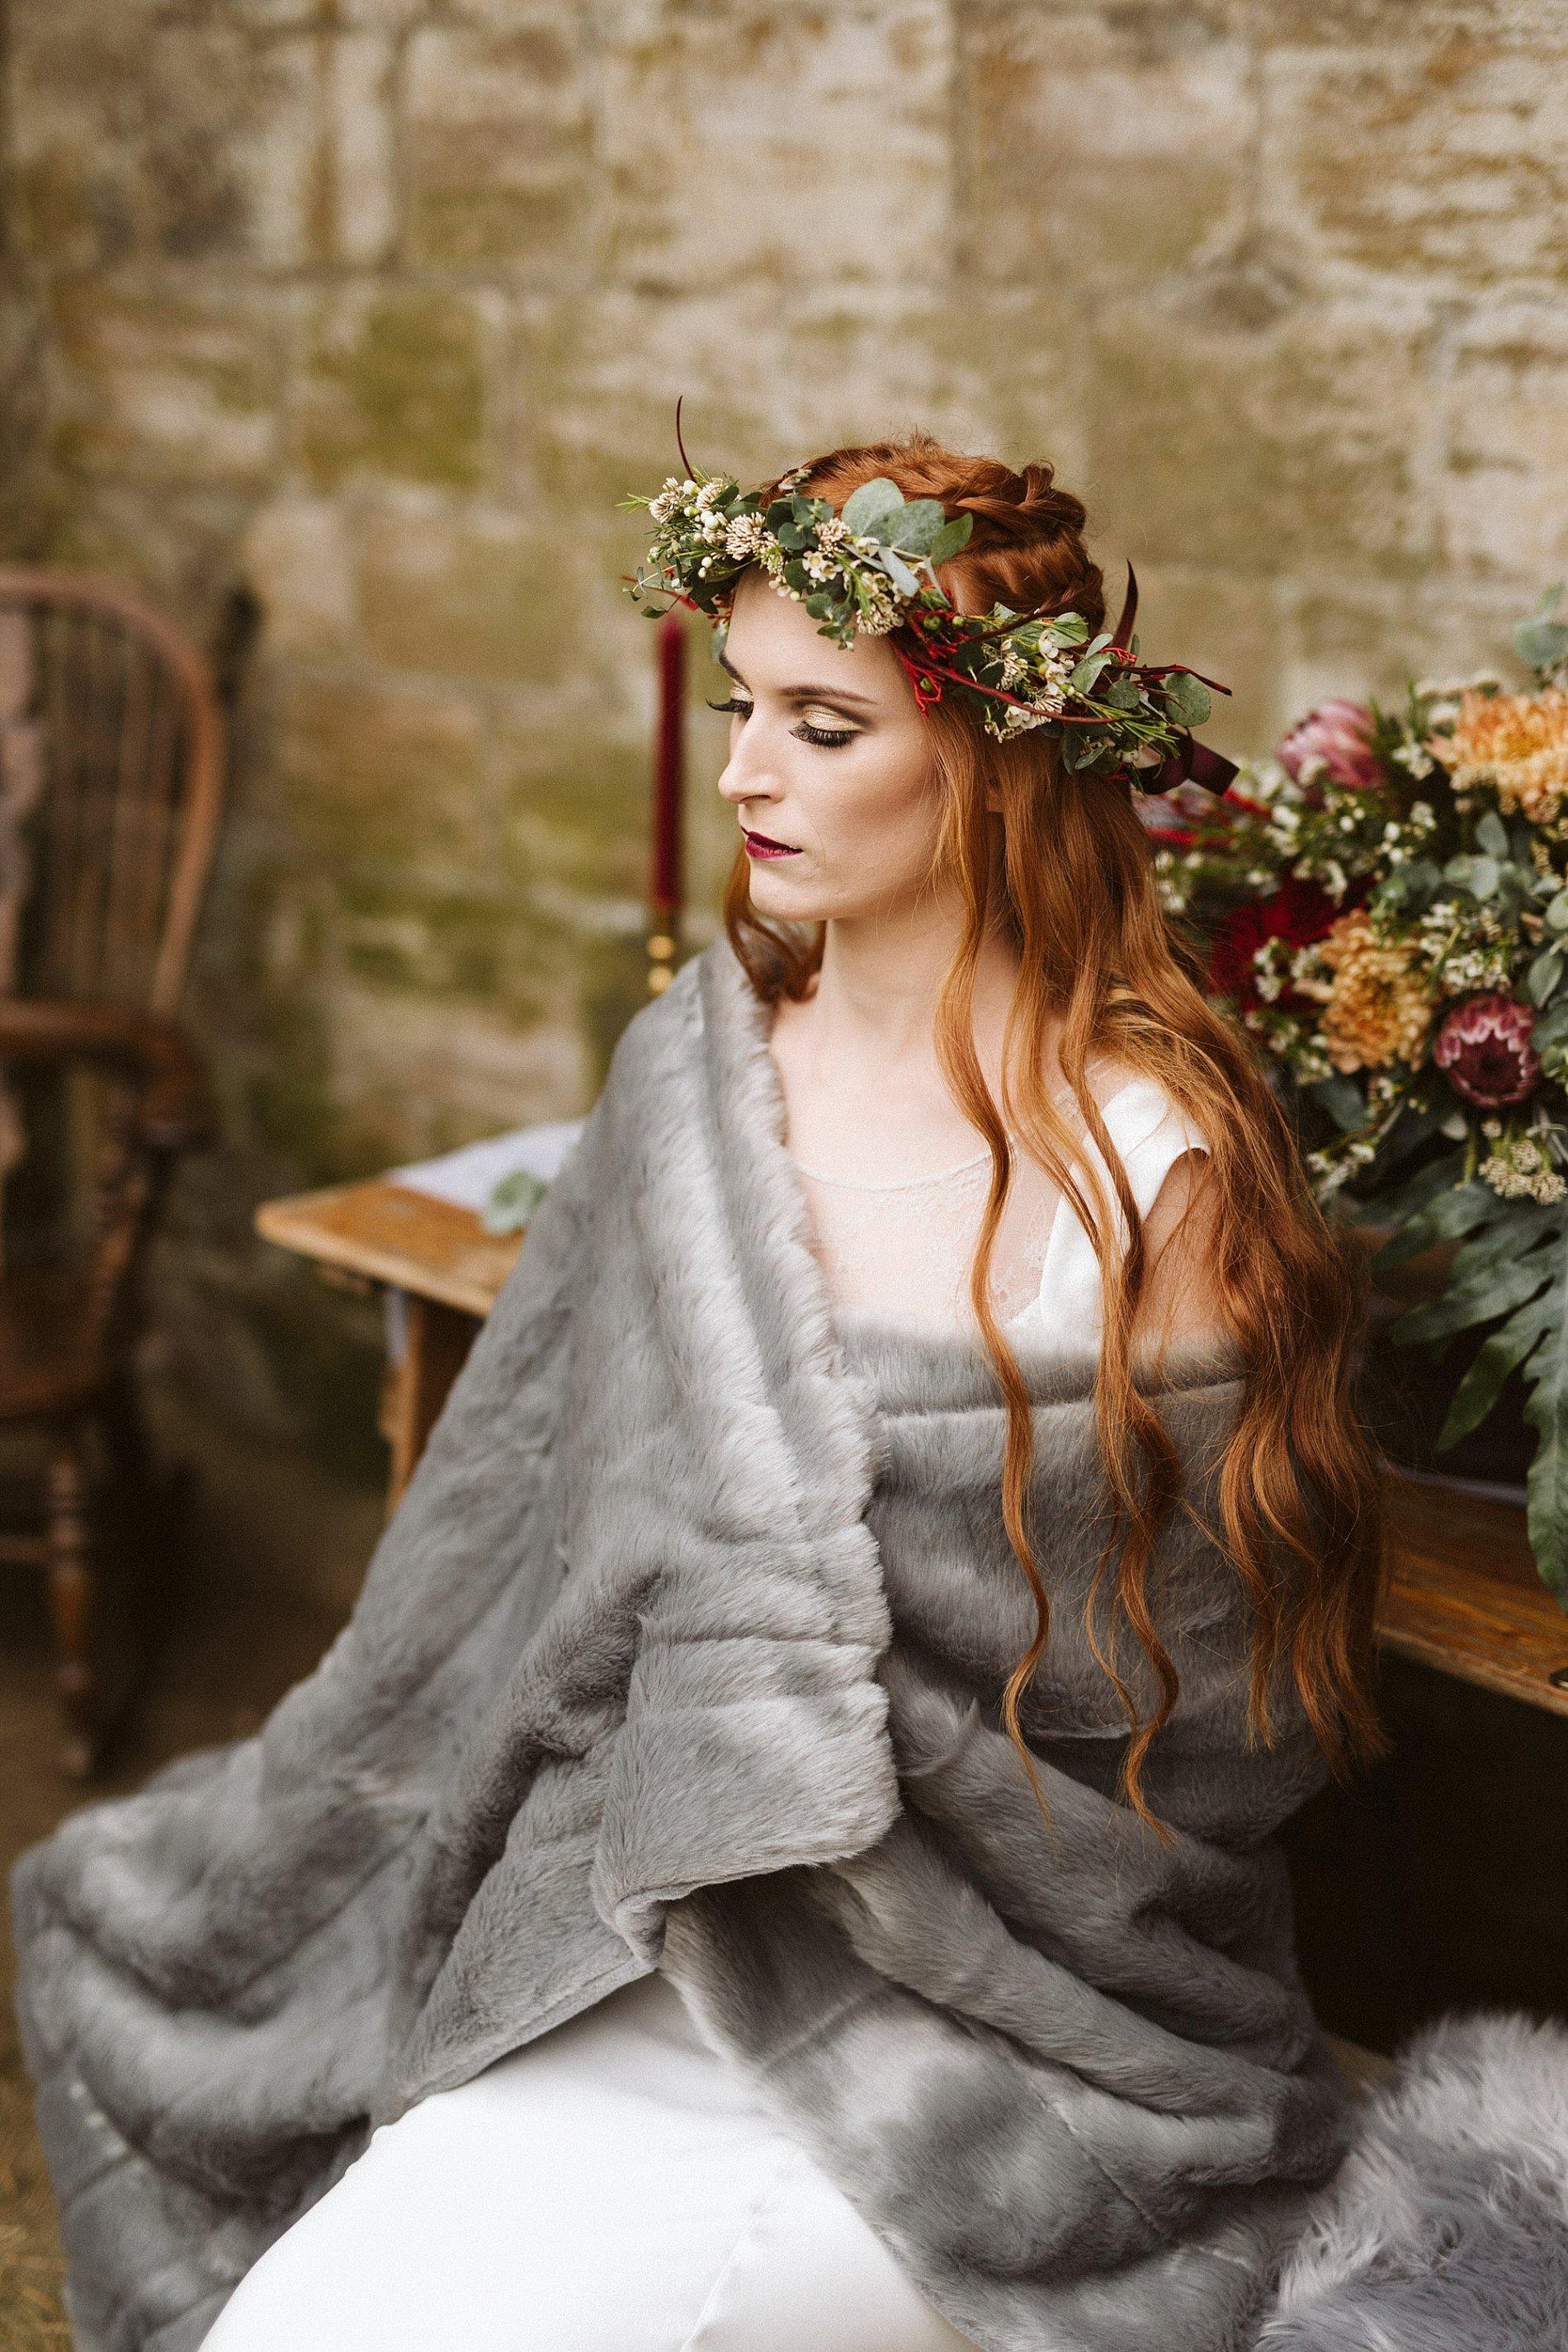 Game of Thrones Creative Bridal Shoot (c) Freya Raby (19)